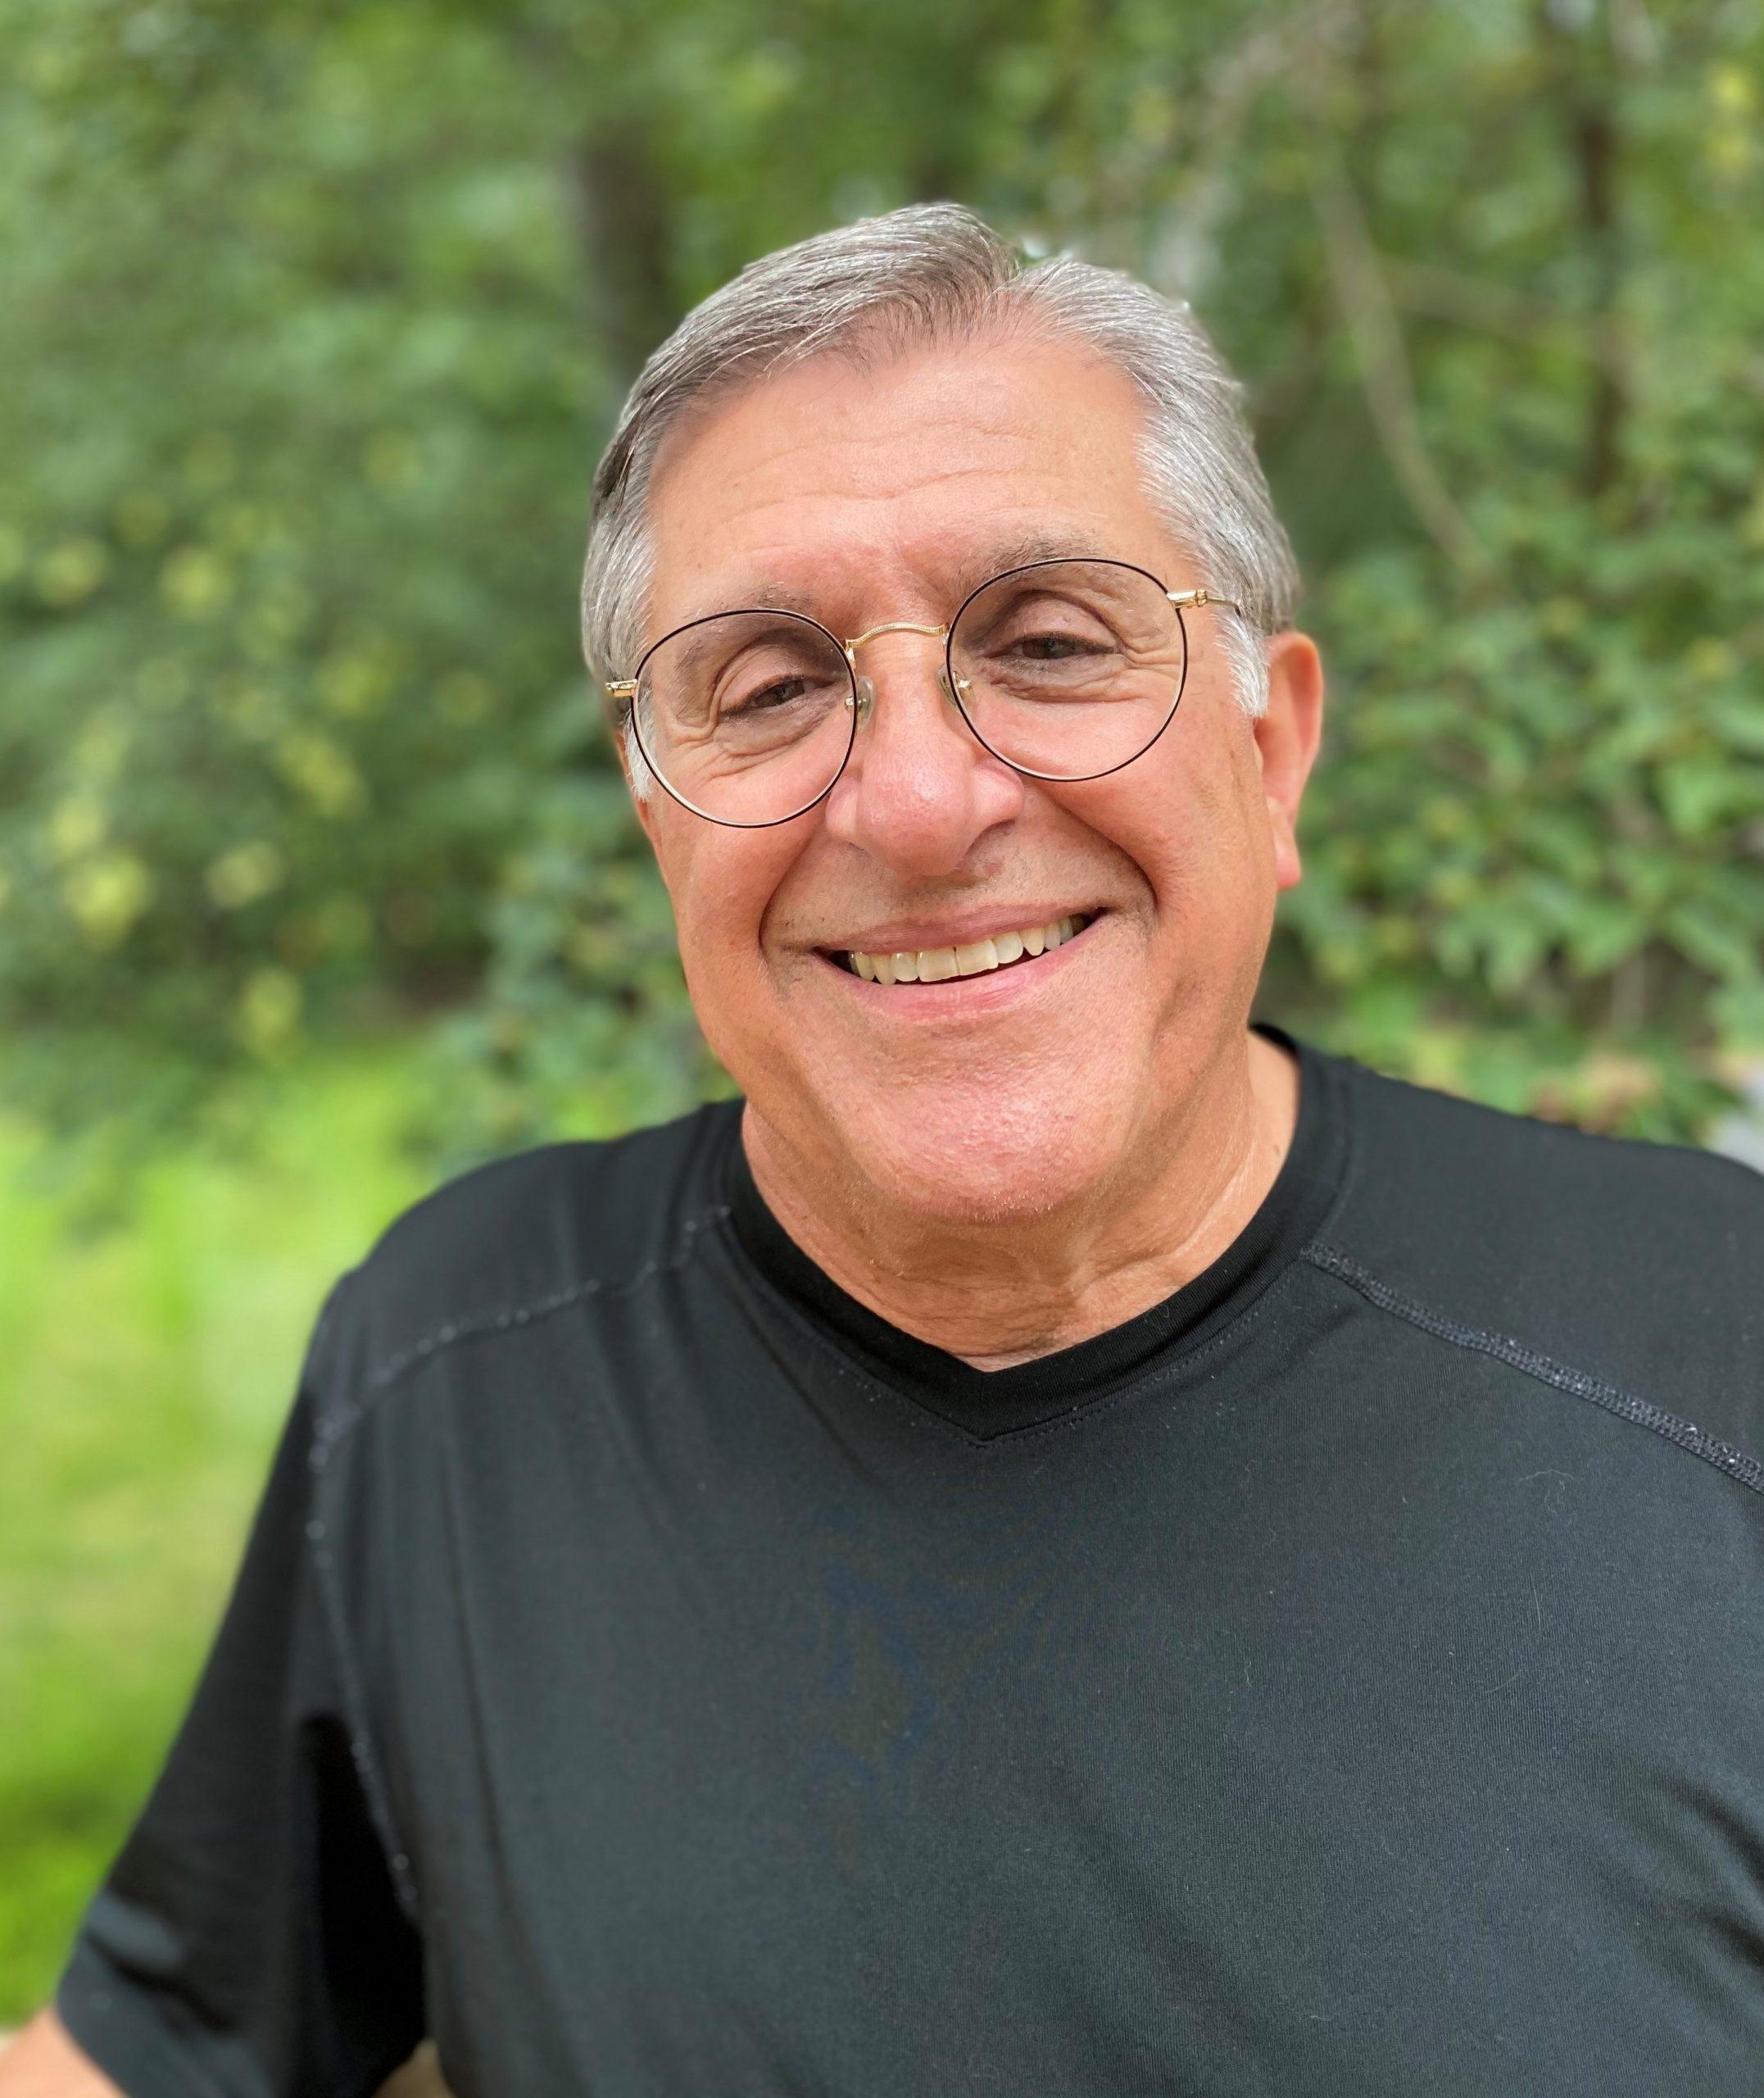 Dr. Ken Bafundo, Phibro Animal Health Corporation